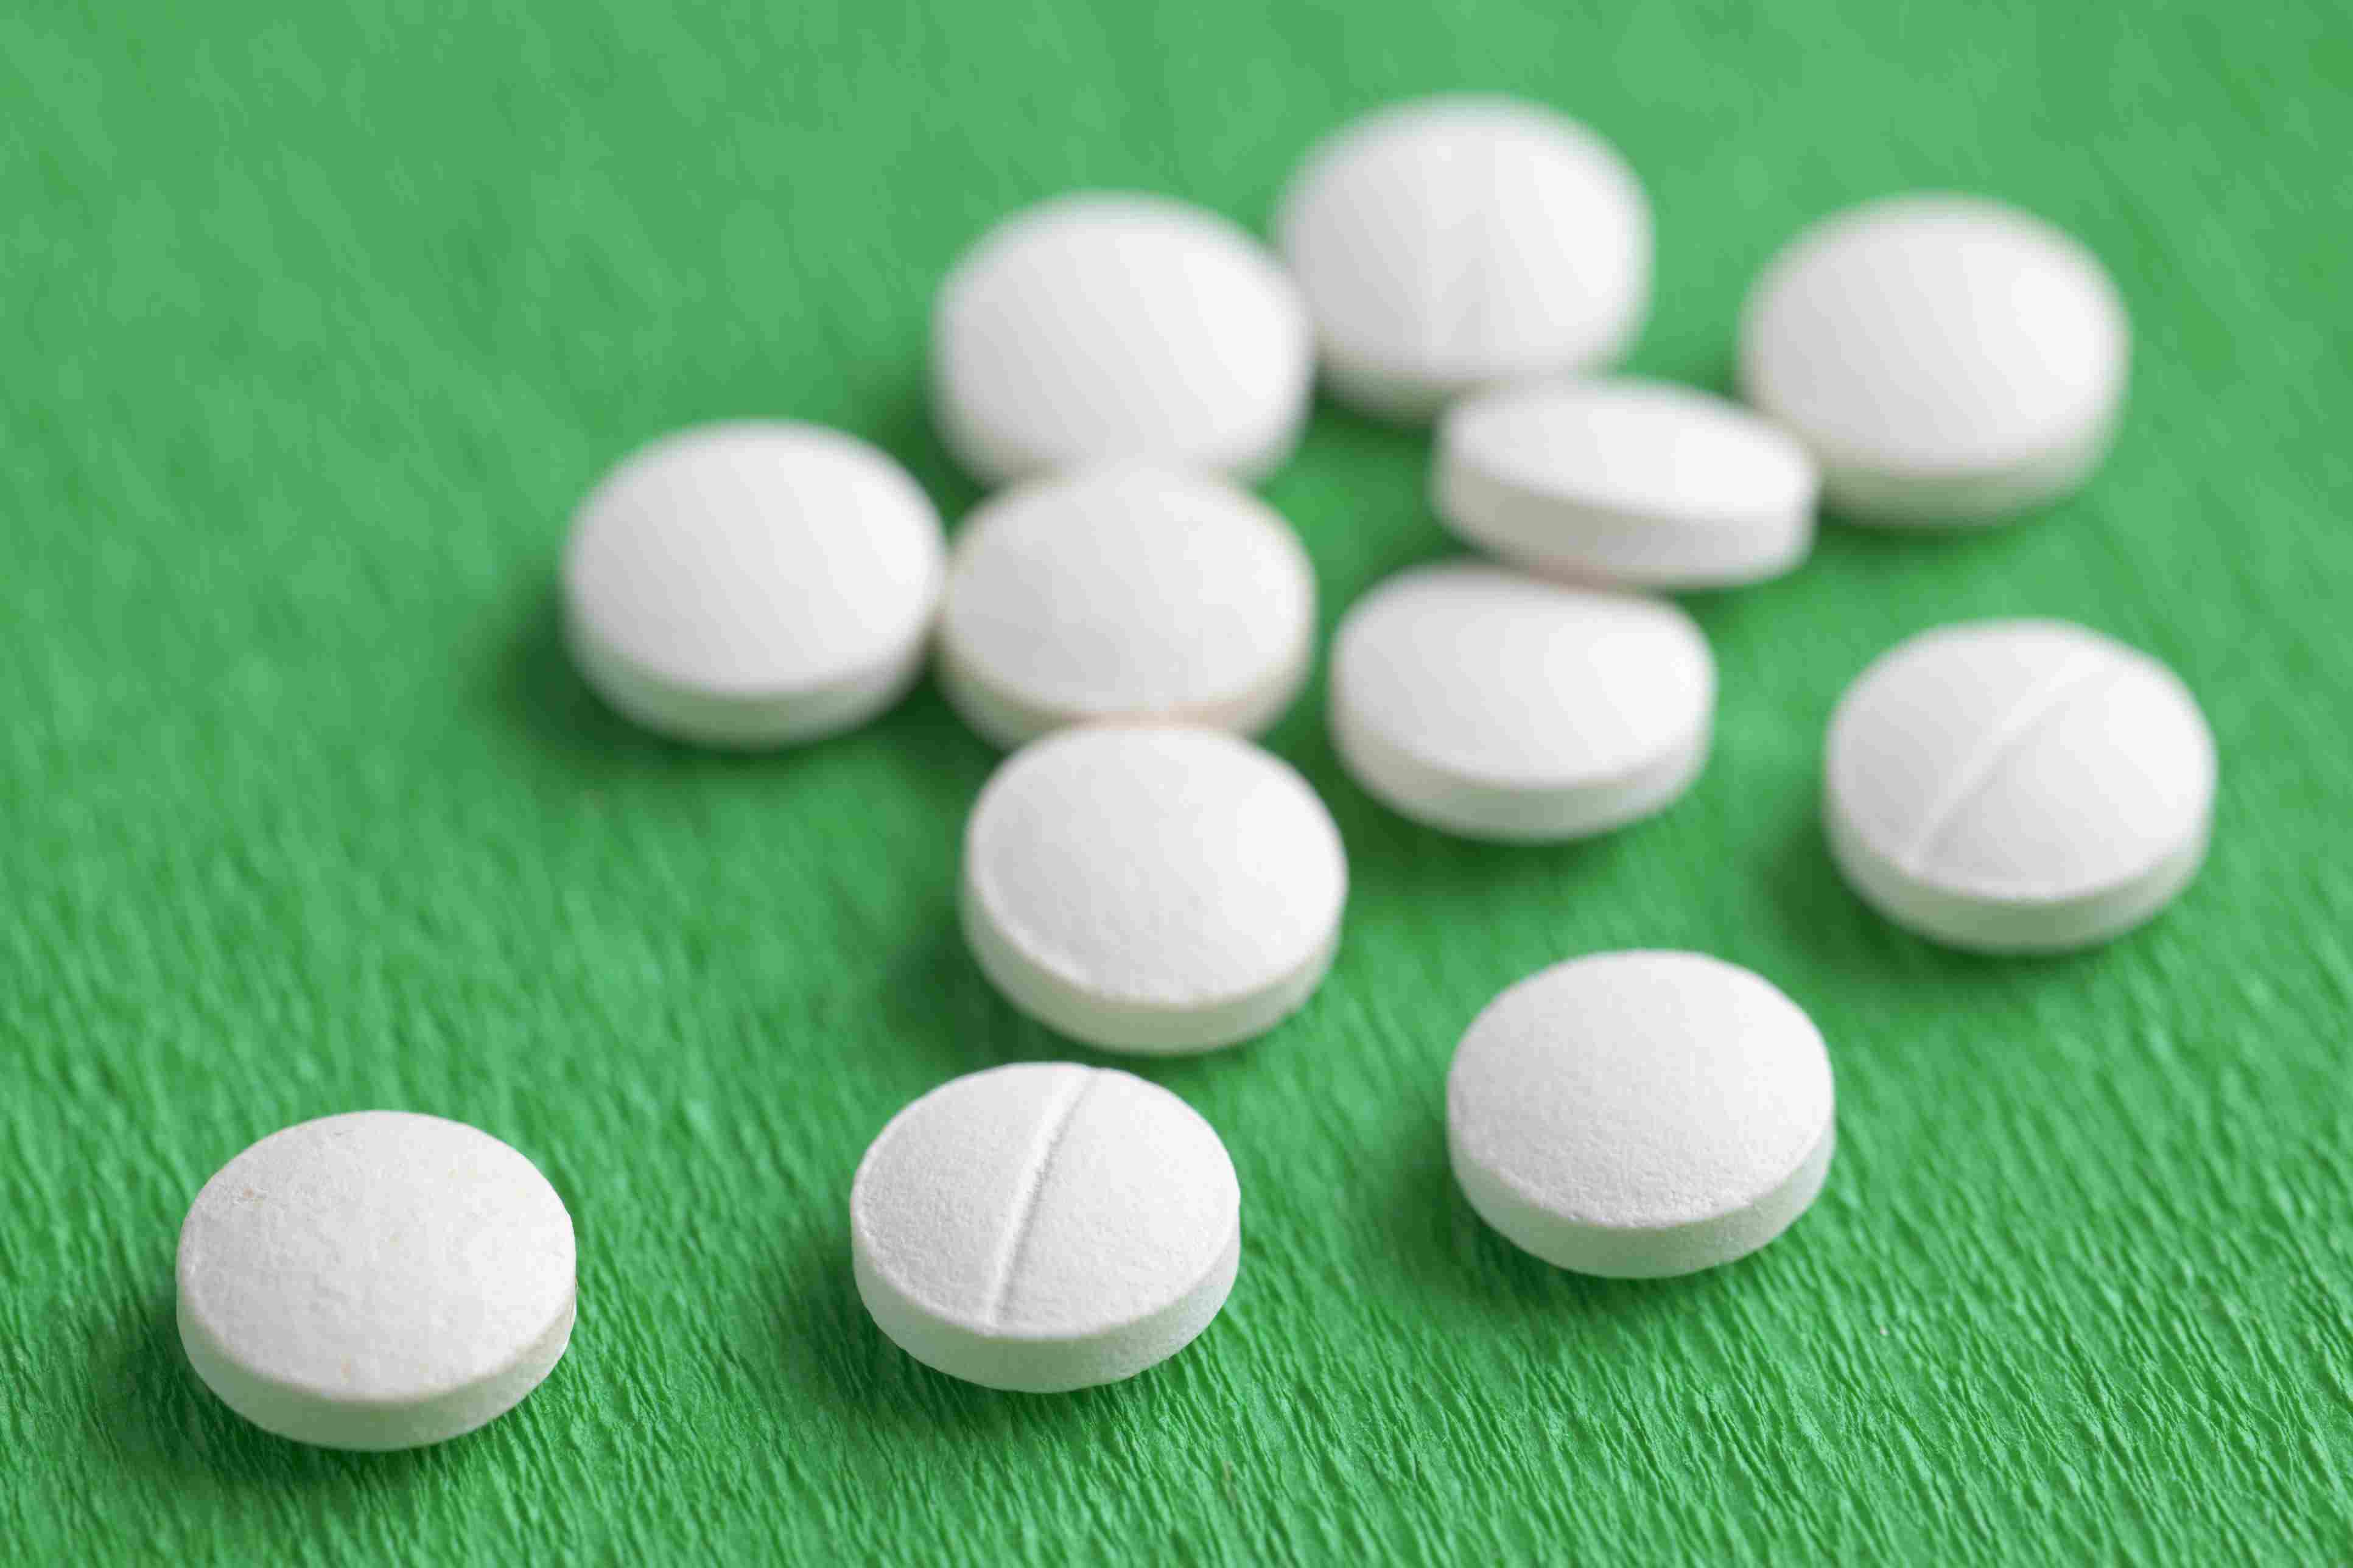 White Melatonin Natural Medicine Sleeping Pills on Green Background